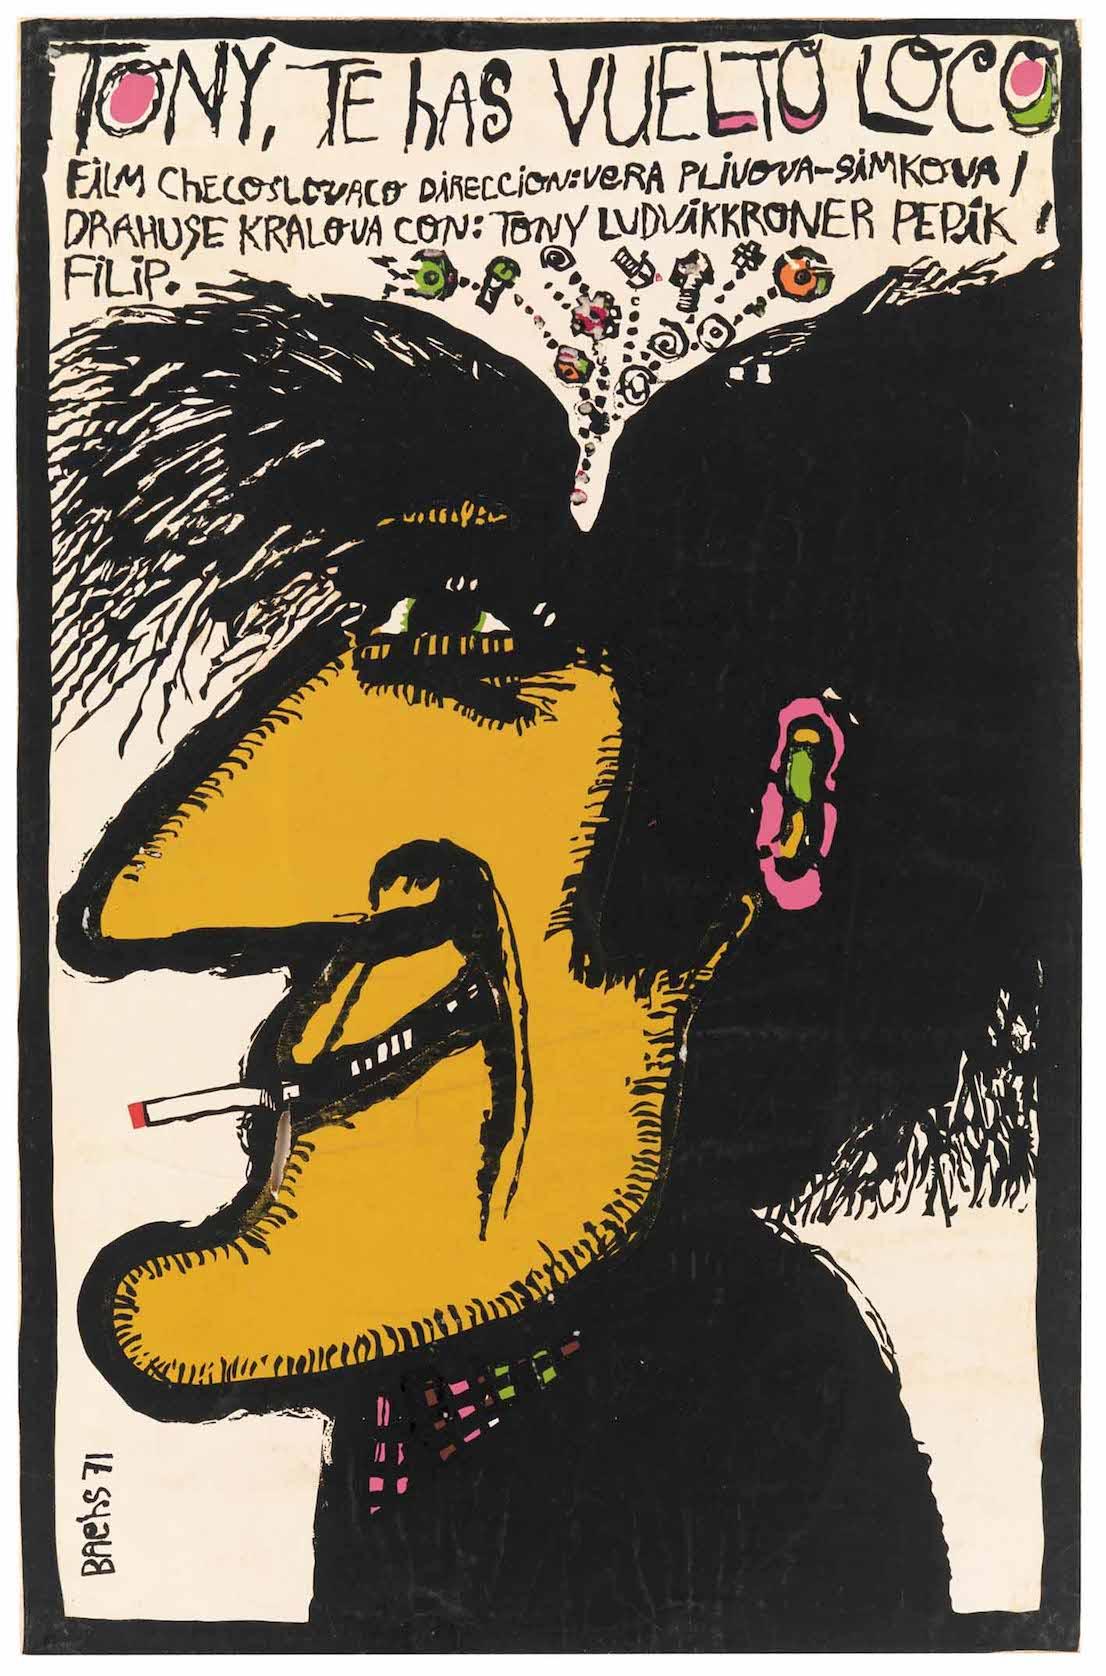 Eduardo Munoz Bachs, Toni, te has vuelto loco, 1971.